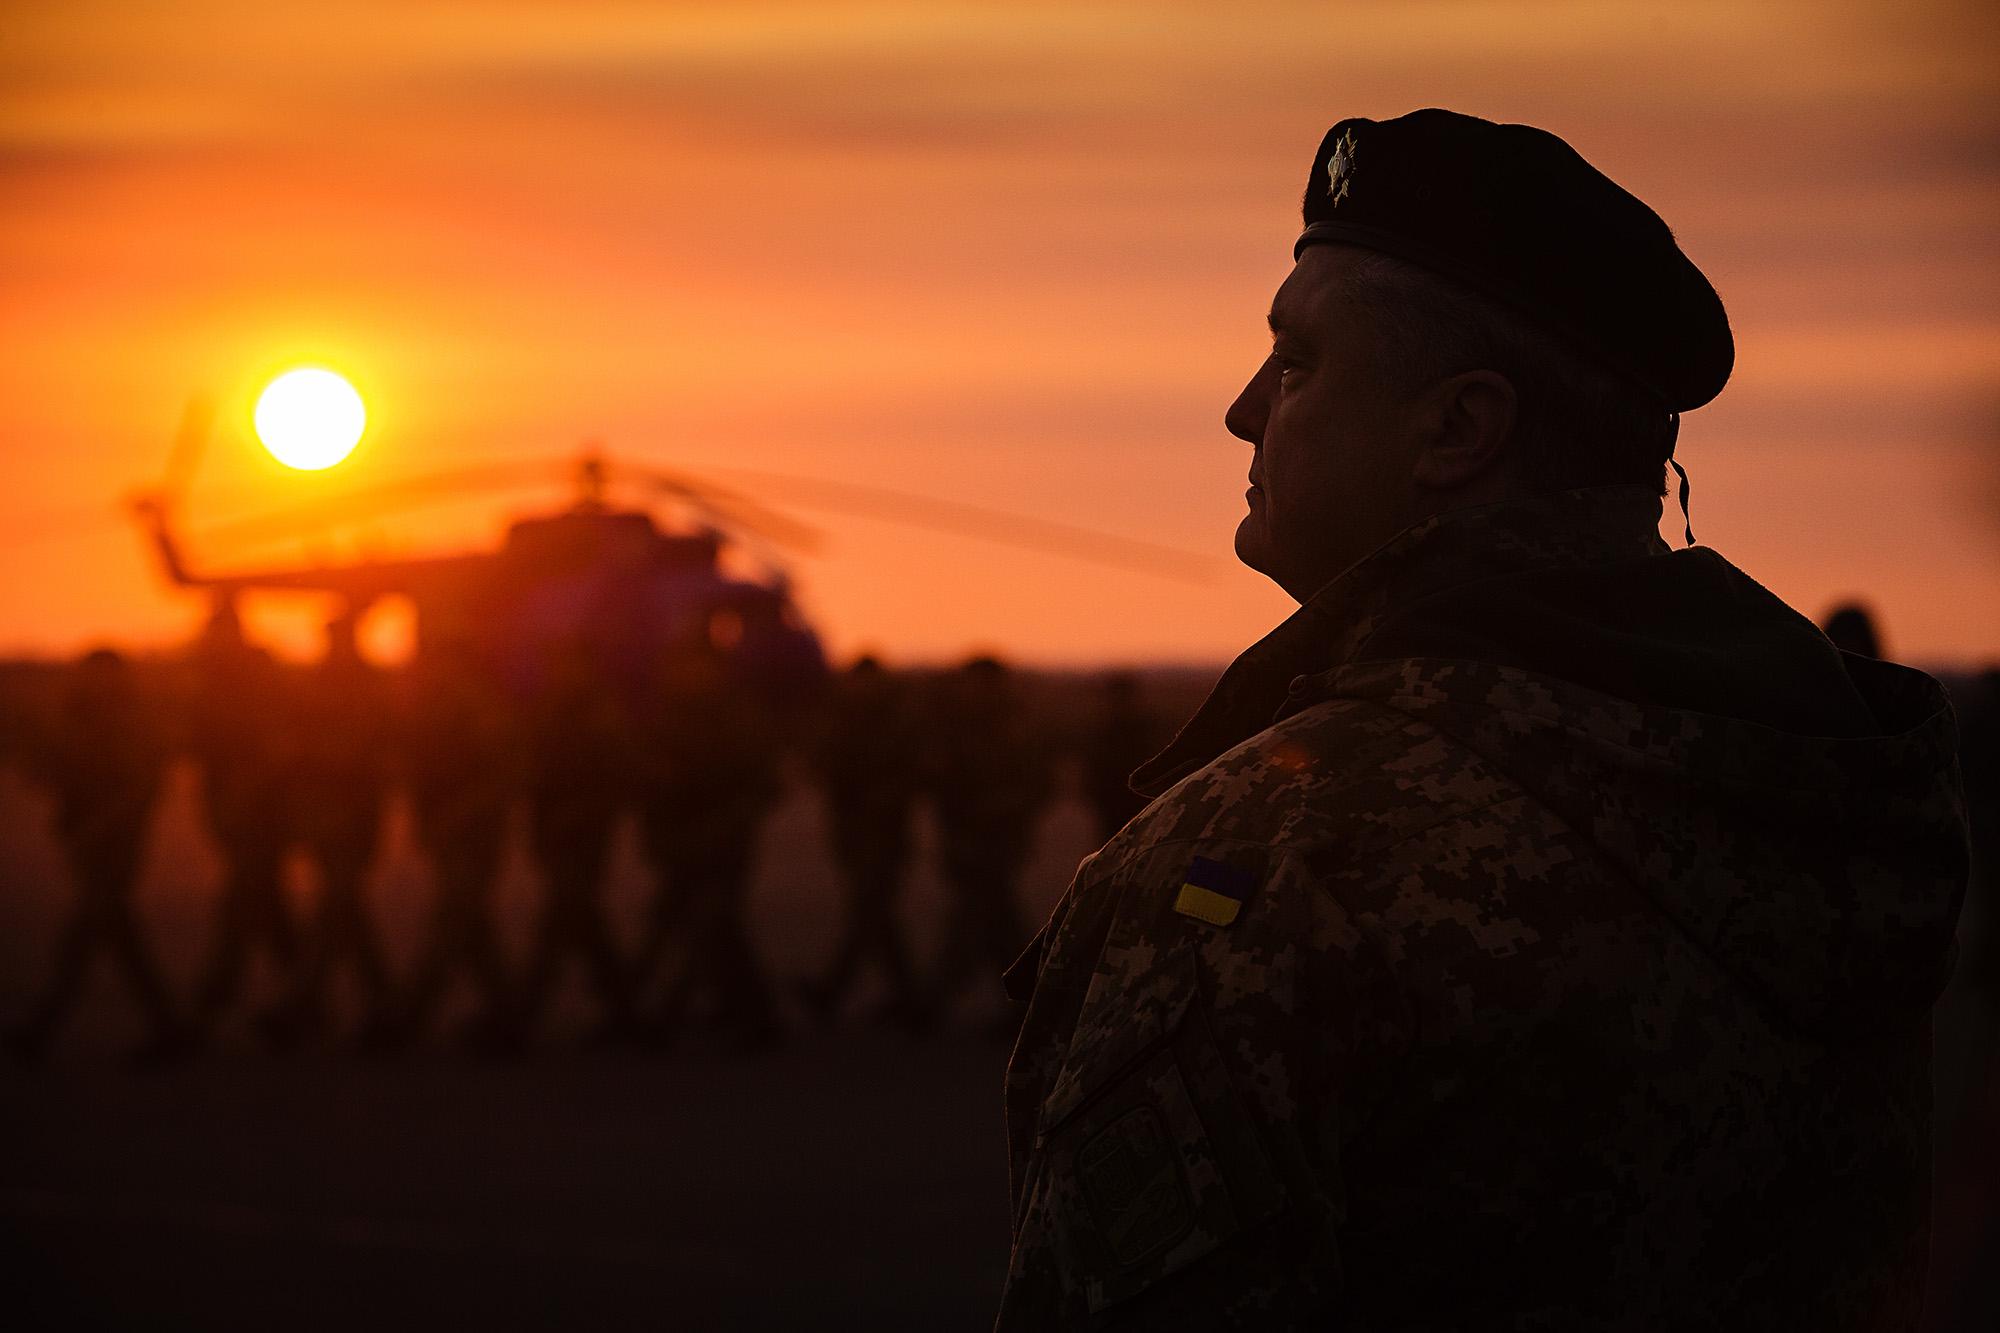 60 найкращих світлин президентства Петра Порошенка (фото)